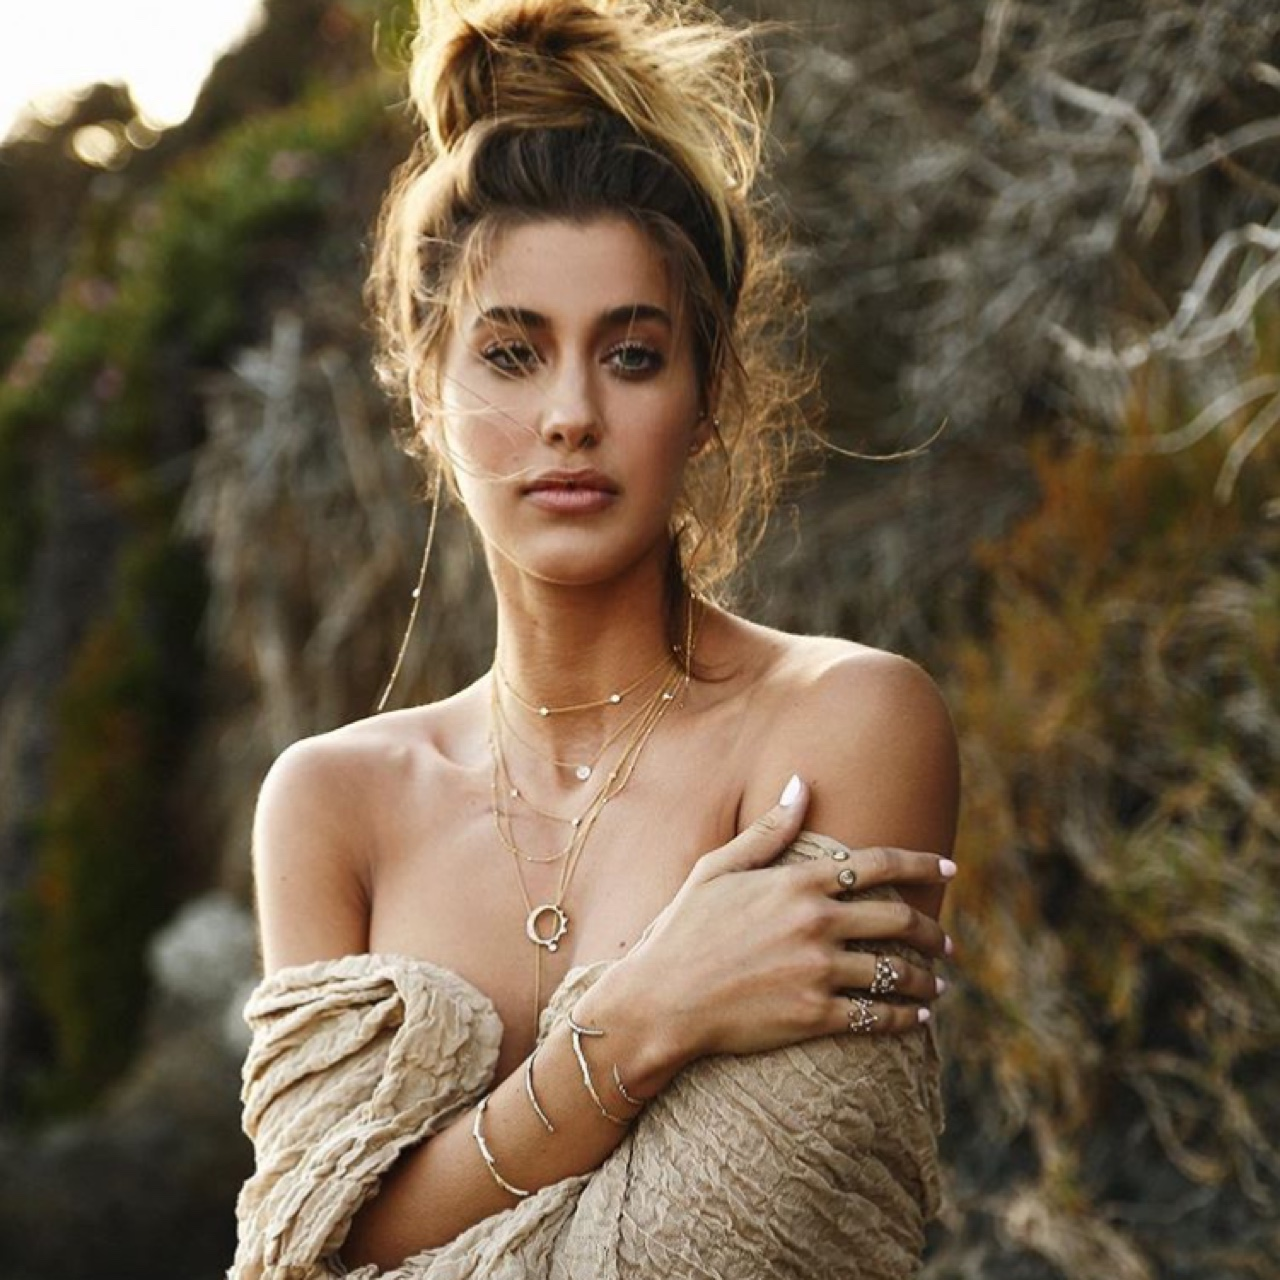 la-boite-d-allumettes-logan-hollowell-paris-fashion-week-2019-bijoux-elsa-hosk-campagne-communication-credit-logan-hollowell